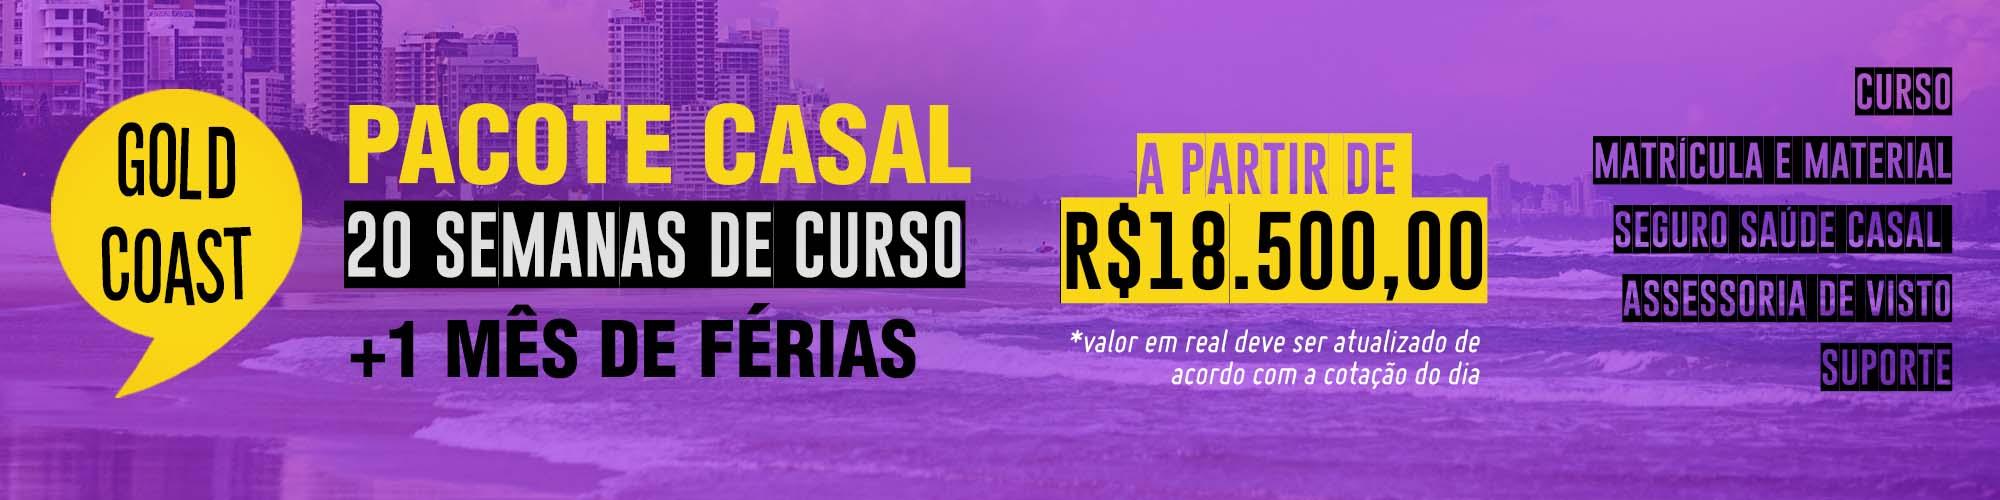 Promo Casal Gold Coast